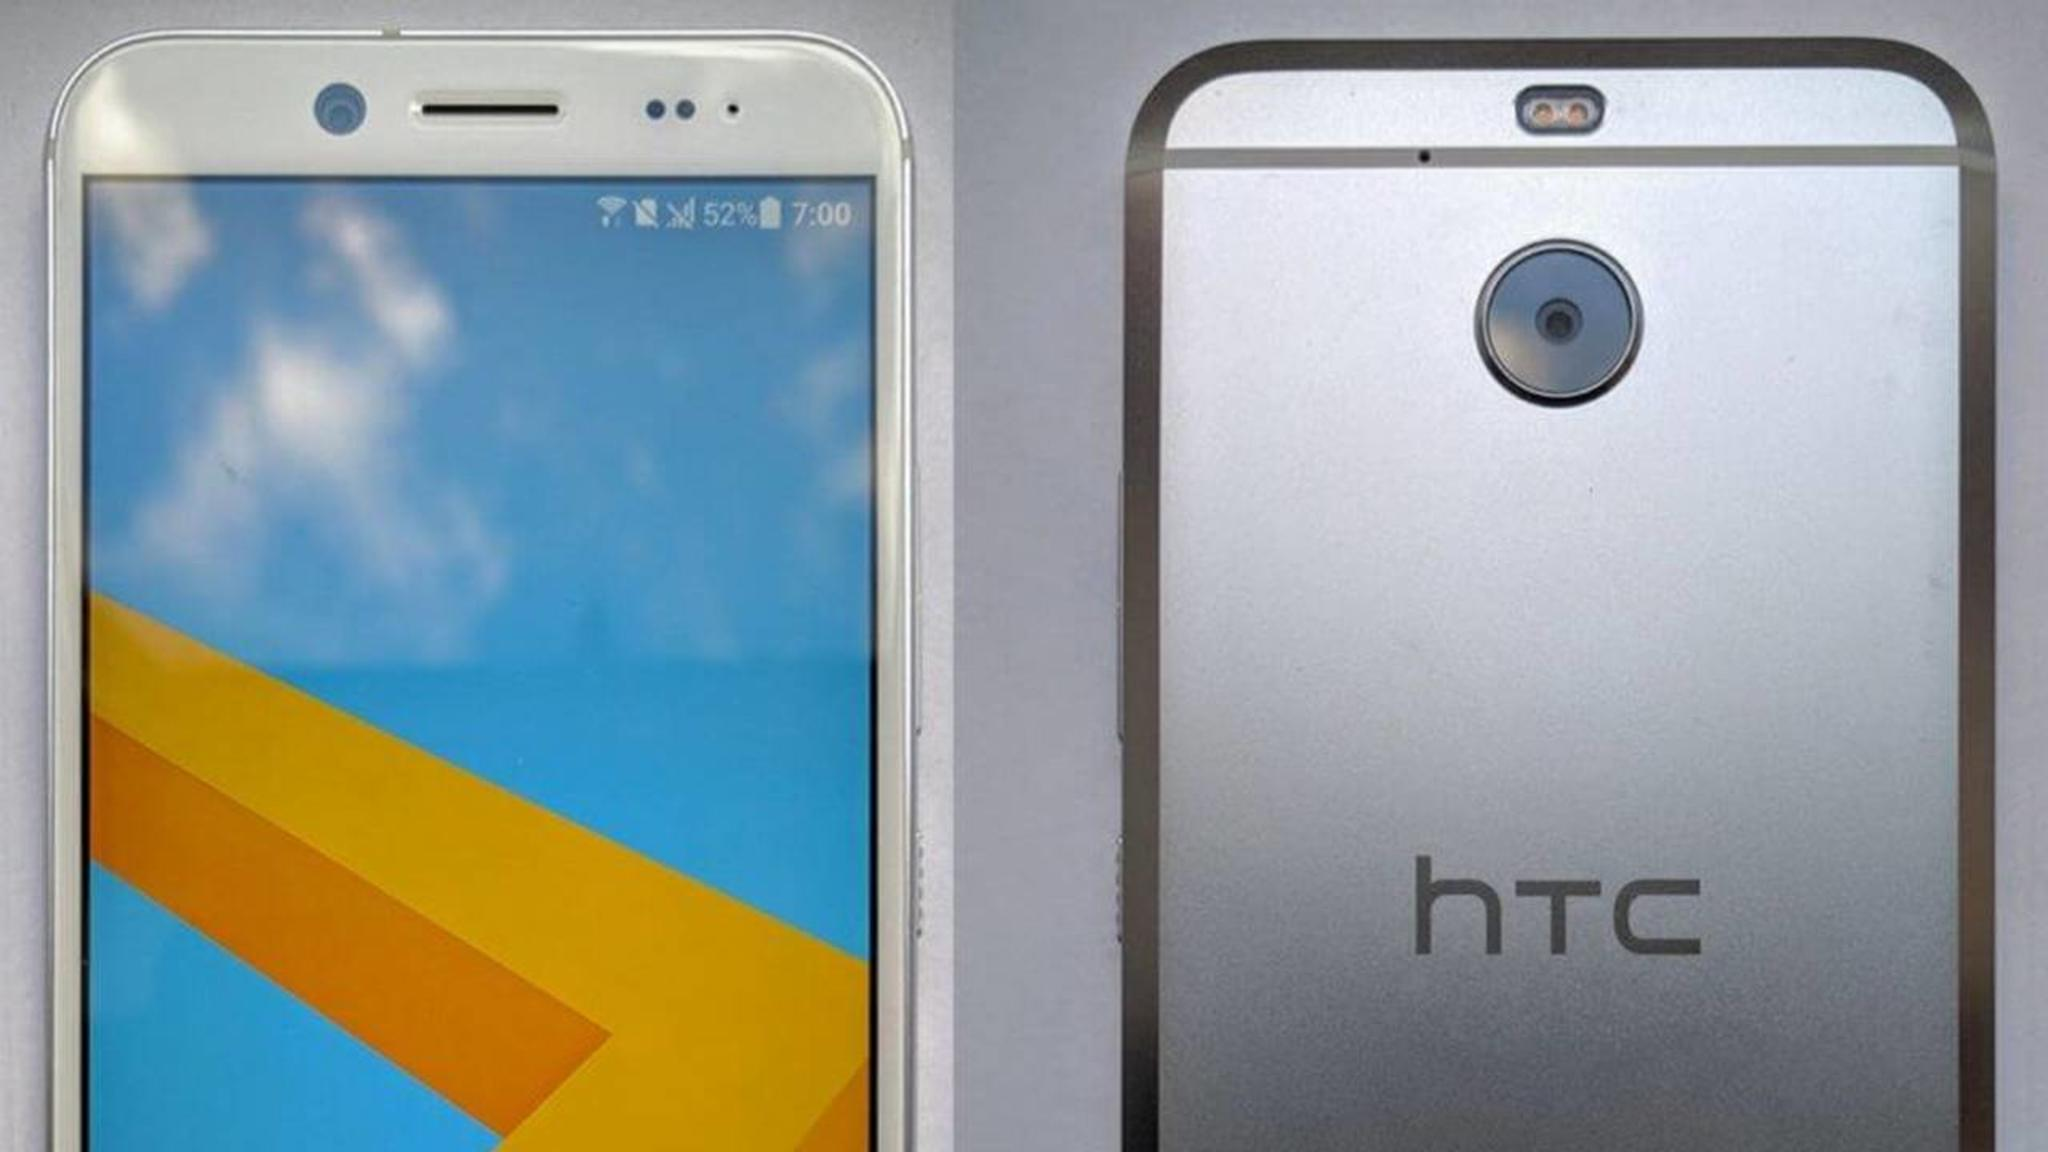 So soll das HTC Bolt aussehen.